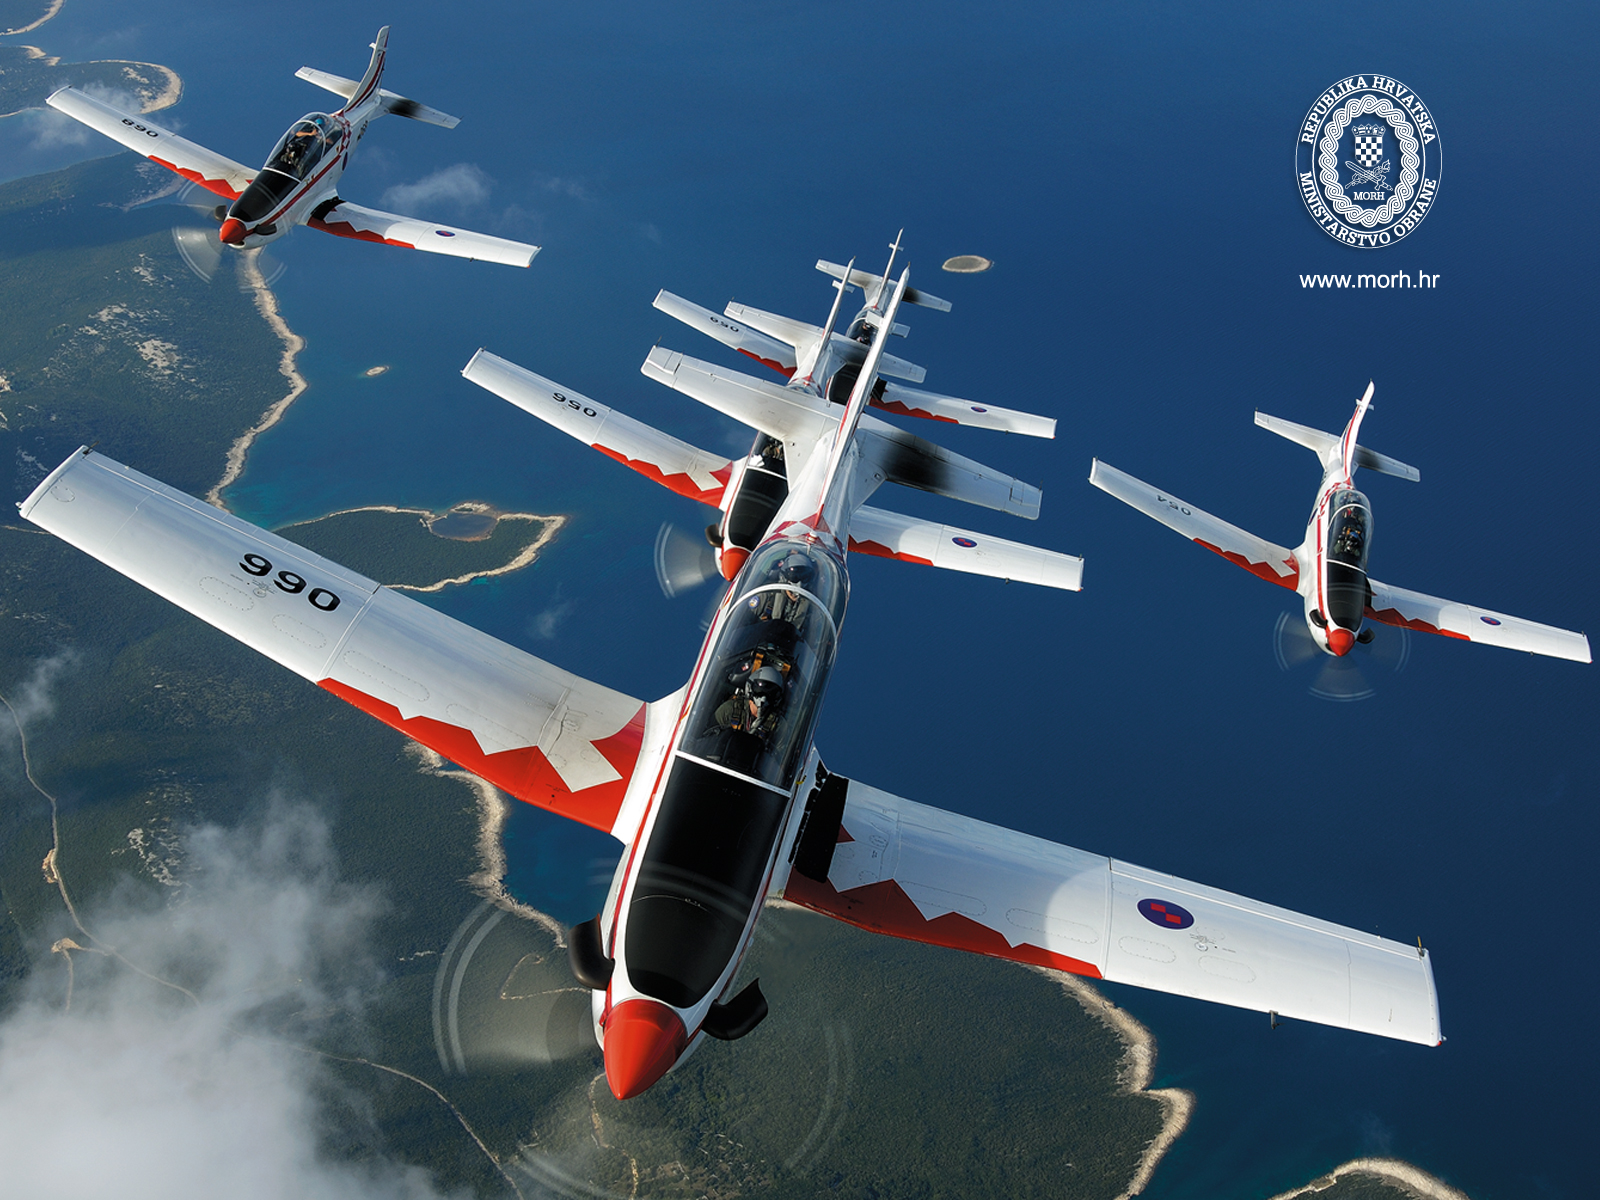 Zrakoplovstvo 1600 x 1200